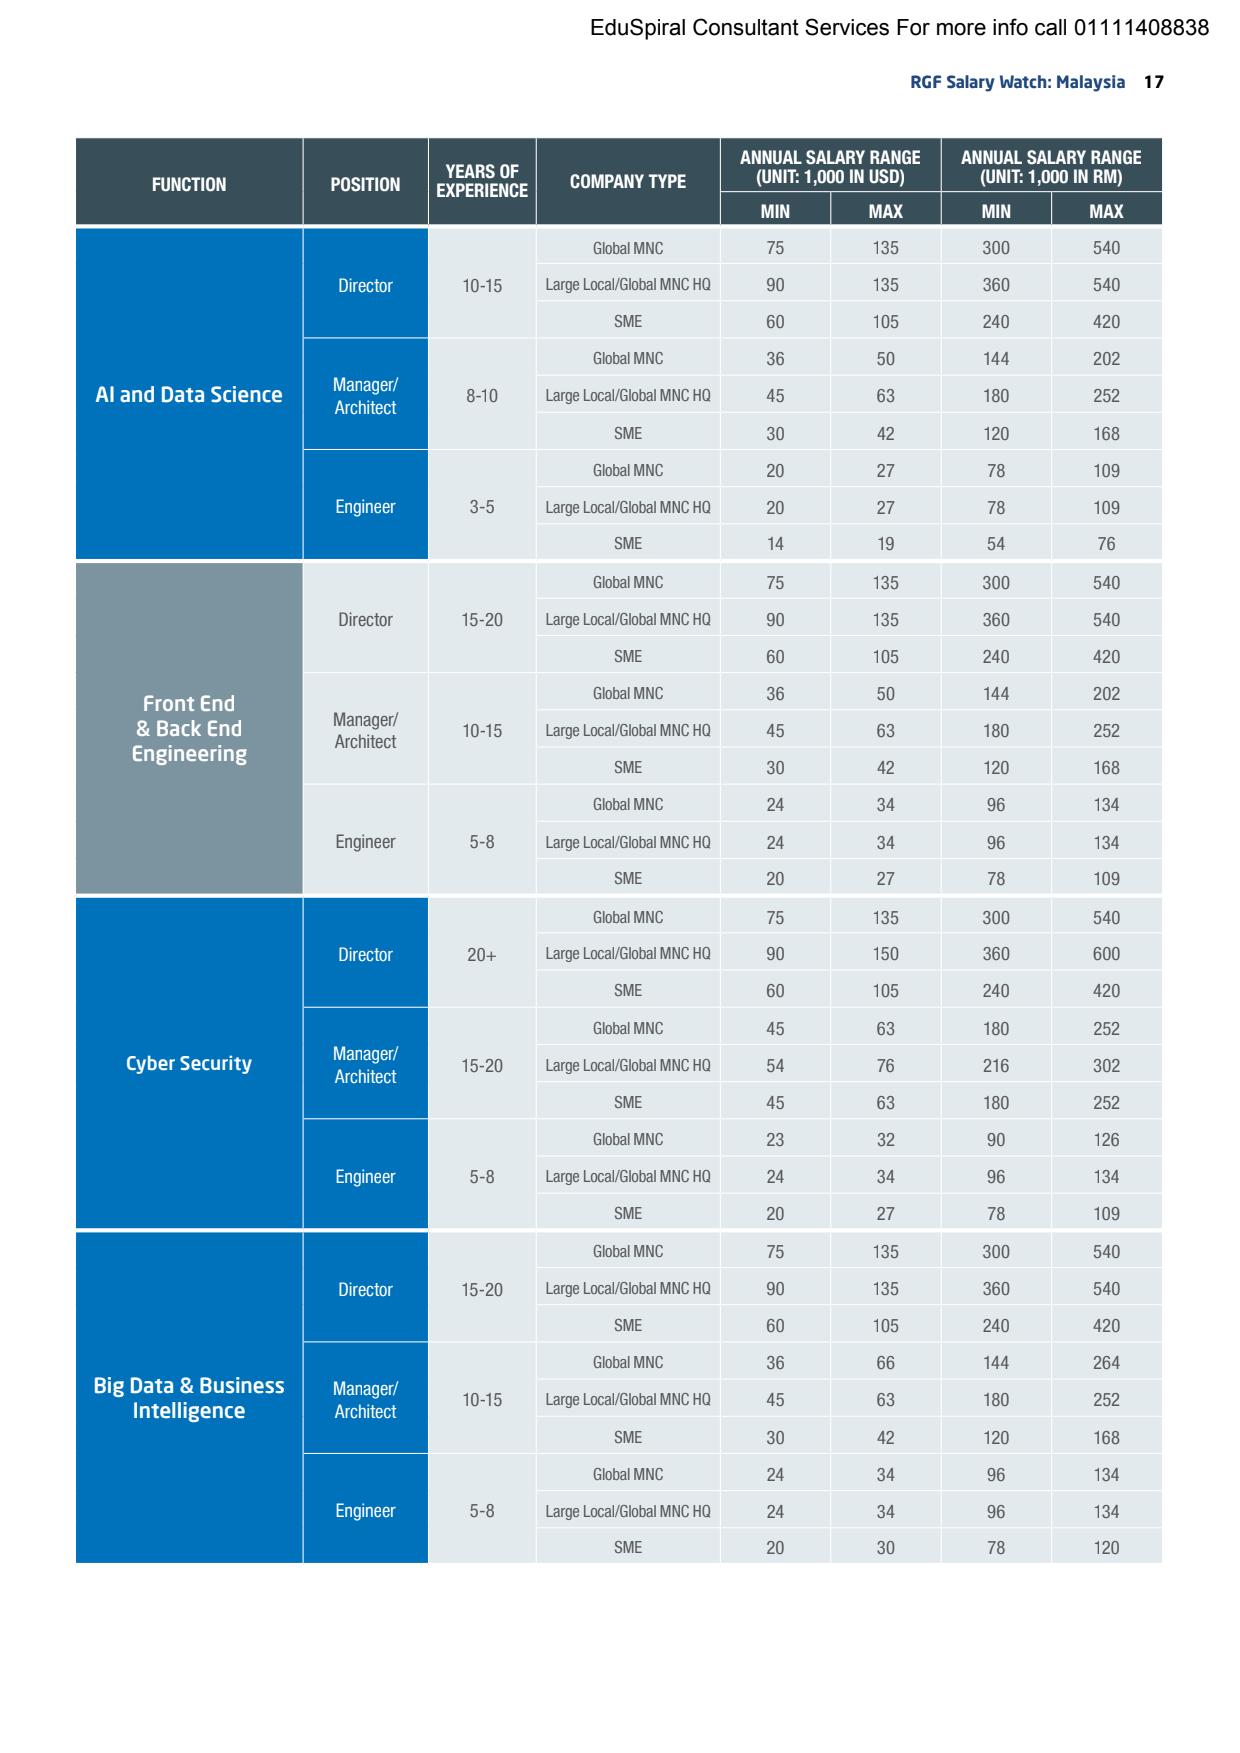 RGF Salary Watch 2020 Malaysia - Artificial Intelligence (AI)